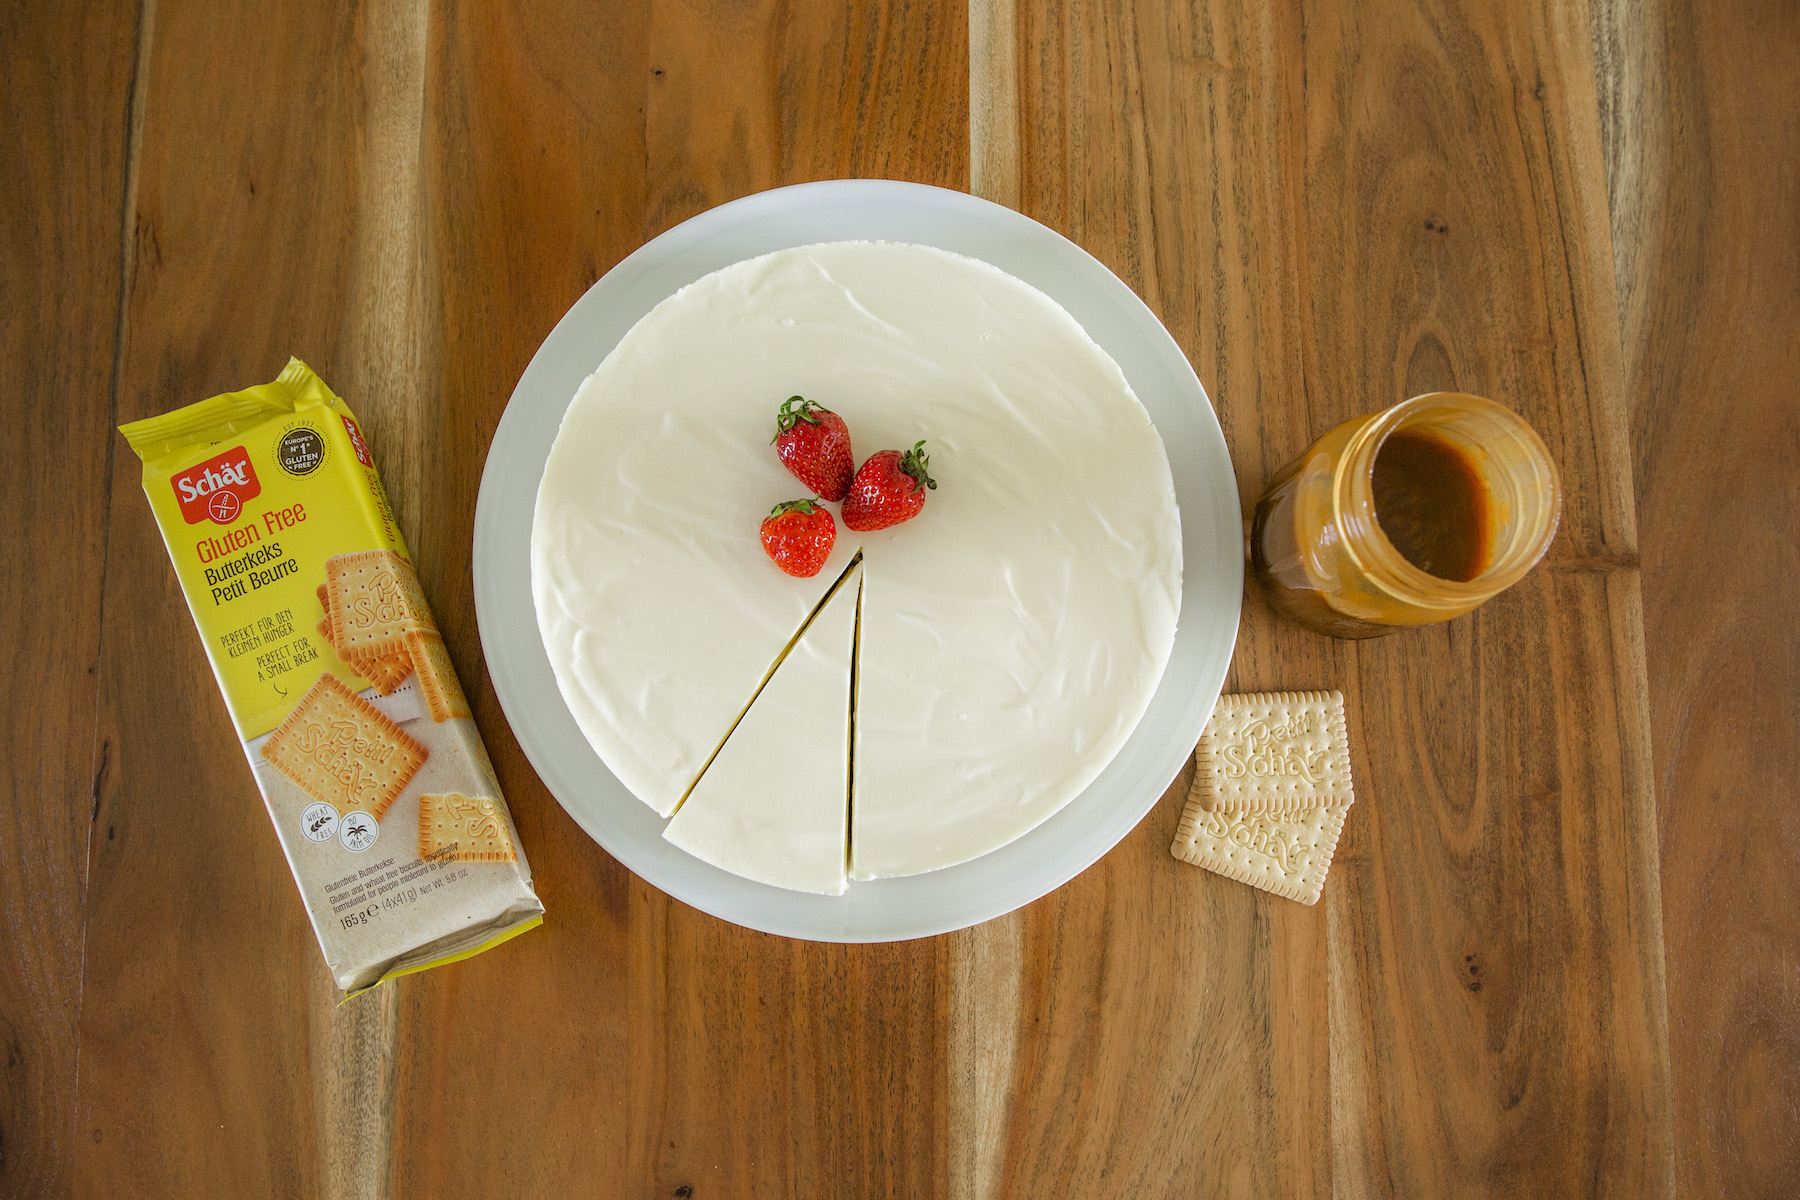 suelovesnyc_salted_caramel_cheesecake_glutenfreier_cheesecake_mit_keksboden_und_gesalzene_karamell_sauce_schaer_butterkekse_schar